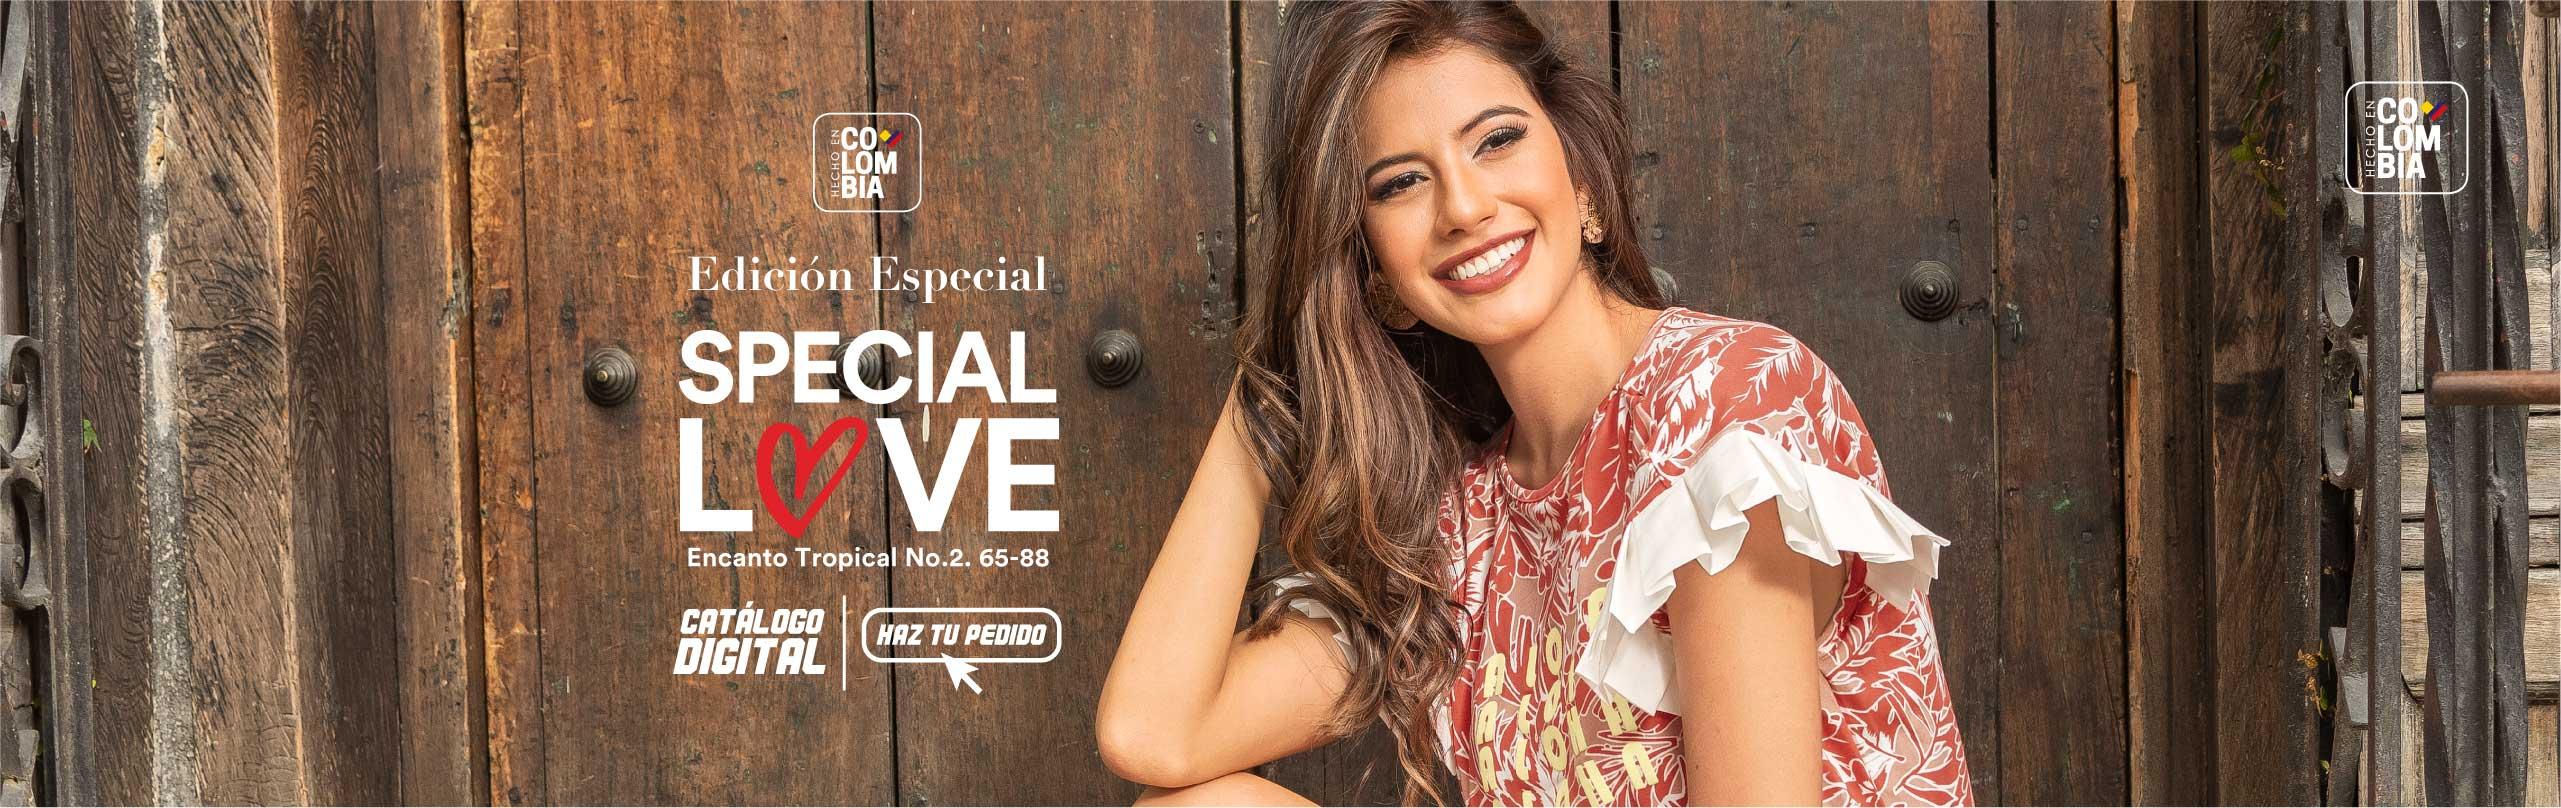 special-love-ebba-venta-por-catalogo